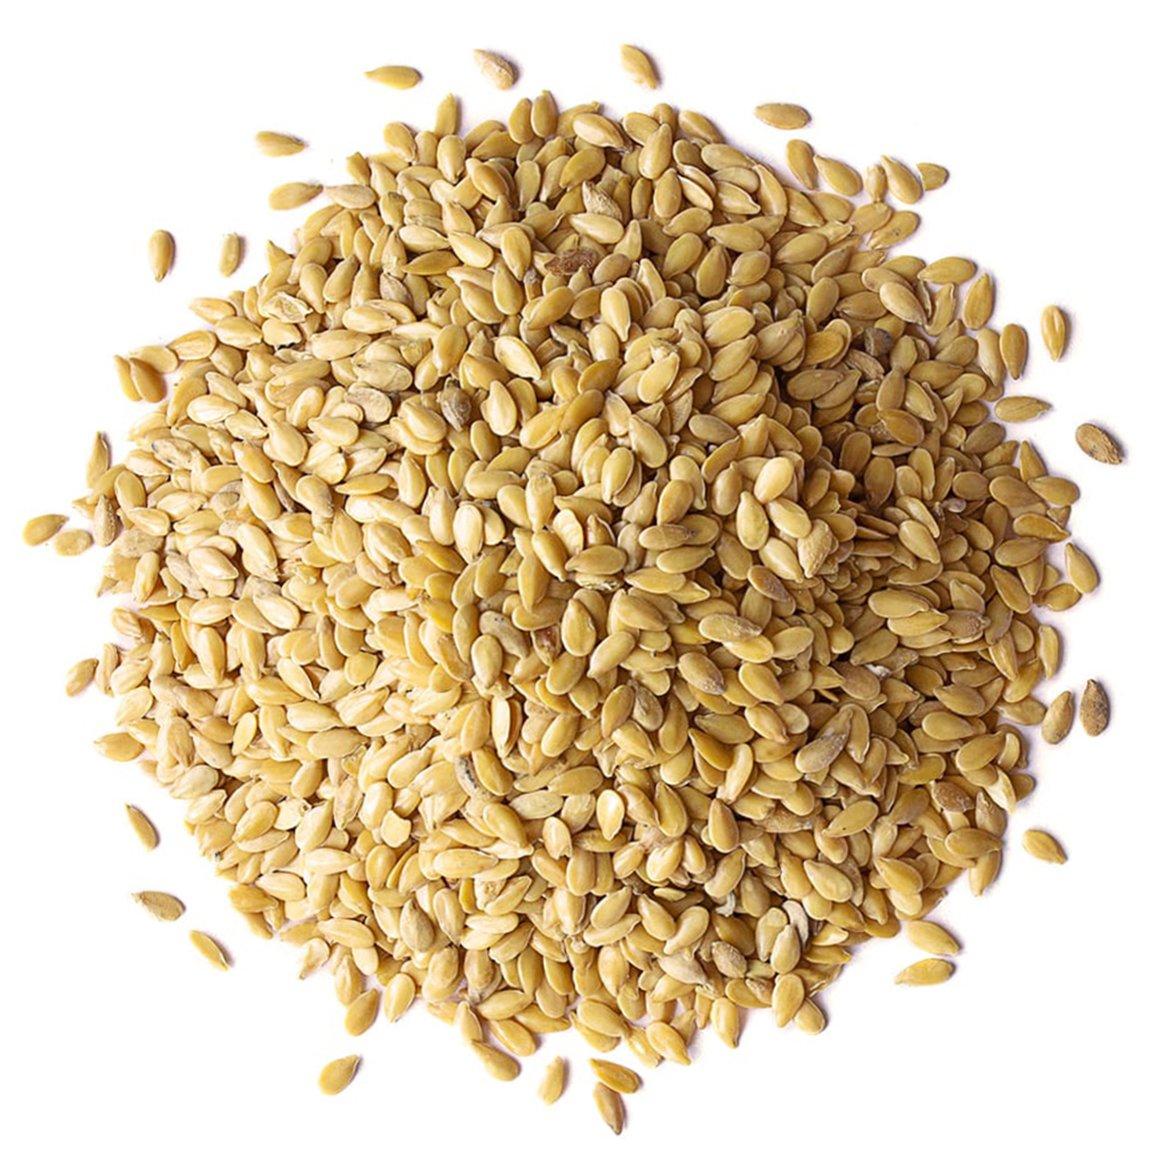 organic-whole-golden-flaxseed-main-min